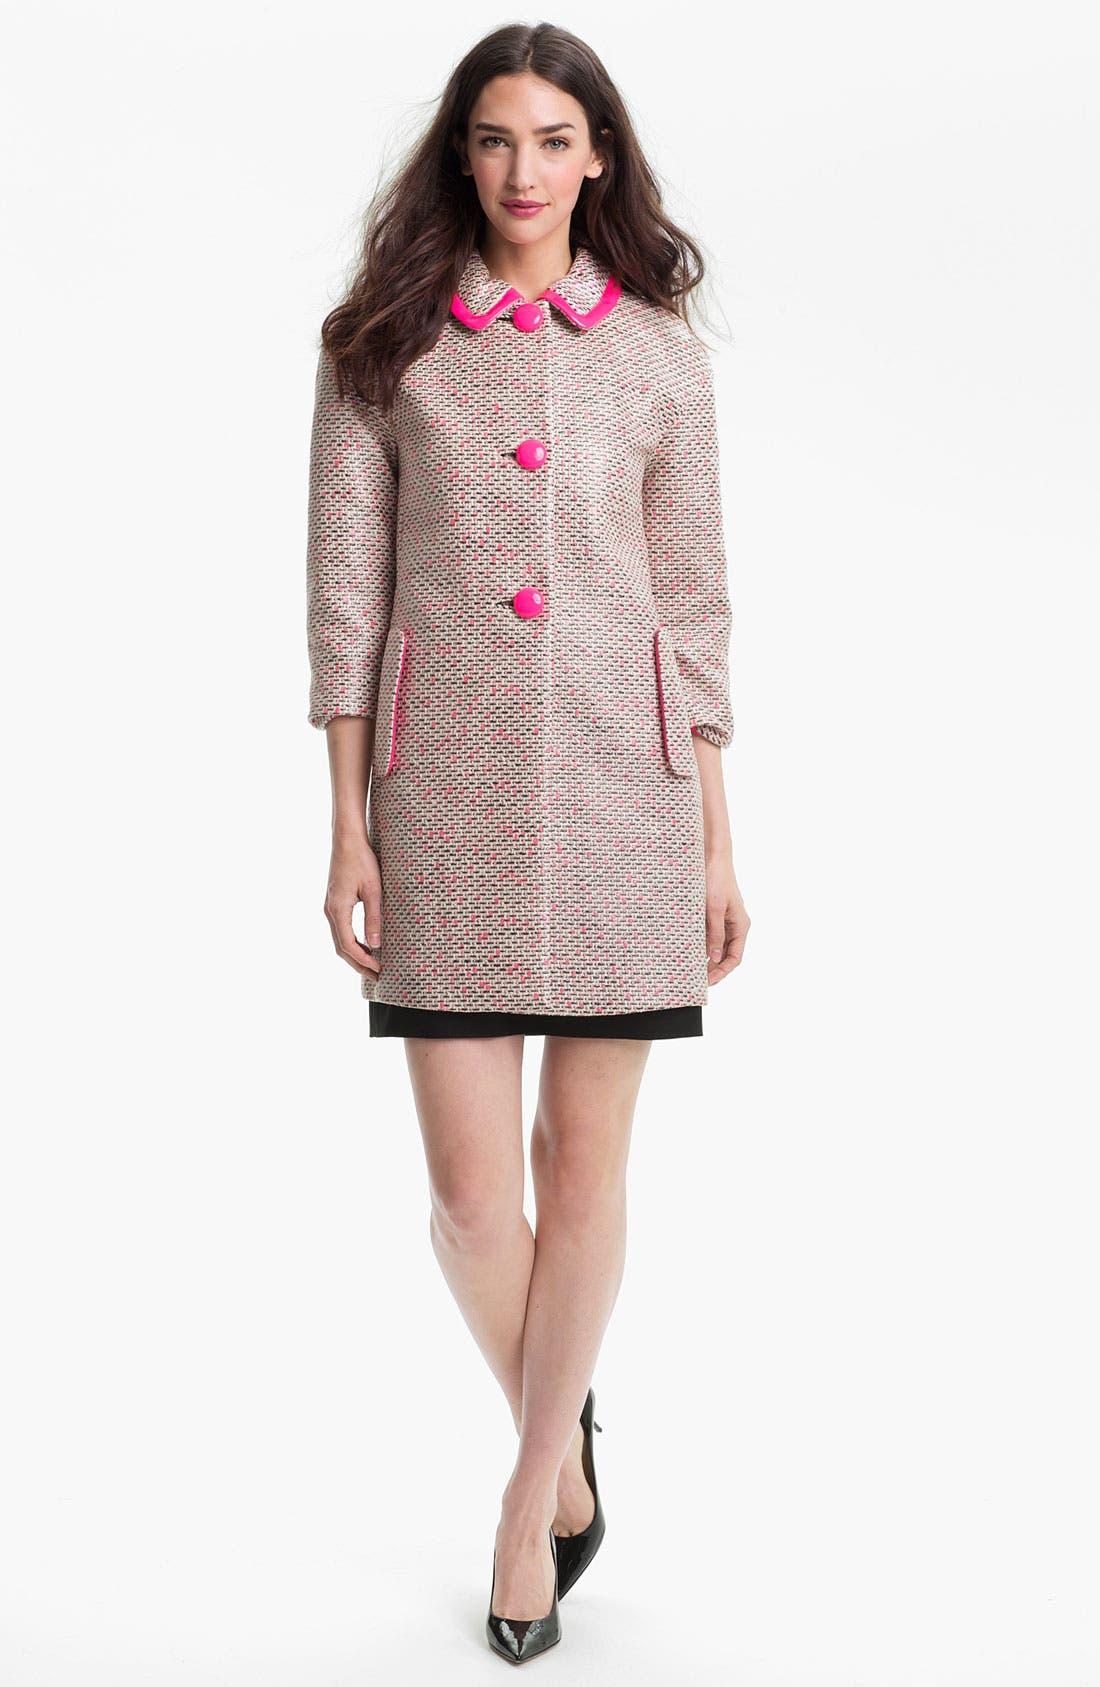 Alternate Image 1 Selected - kate spade new york 'pierce' coat